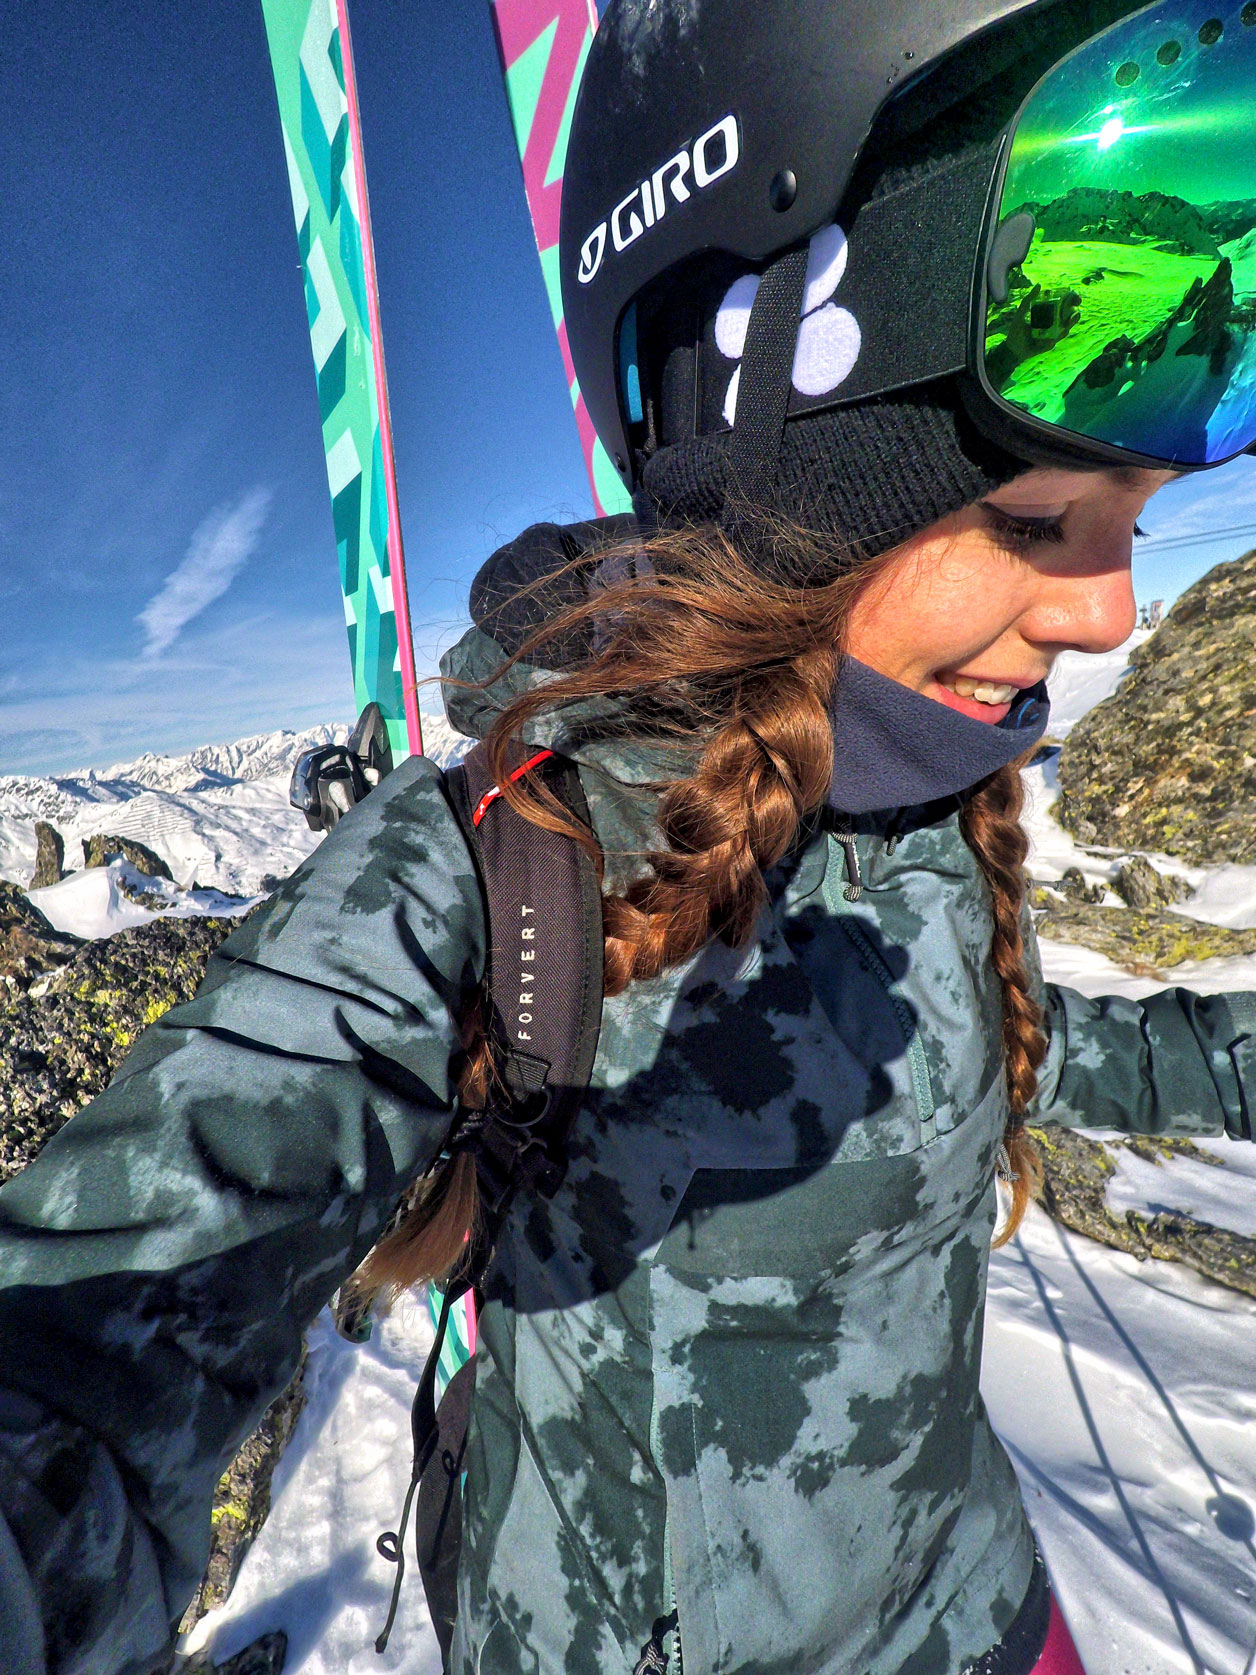 Marlene-Vey-munichmountaingirls-Skitour-Blackcrows-skis-forvert Skitouren und Freeriden